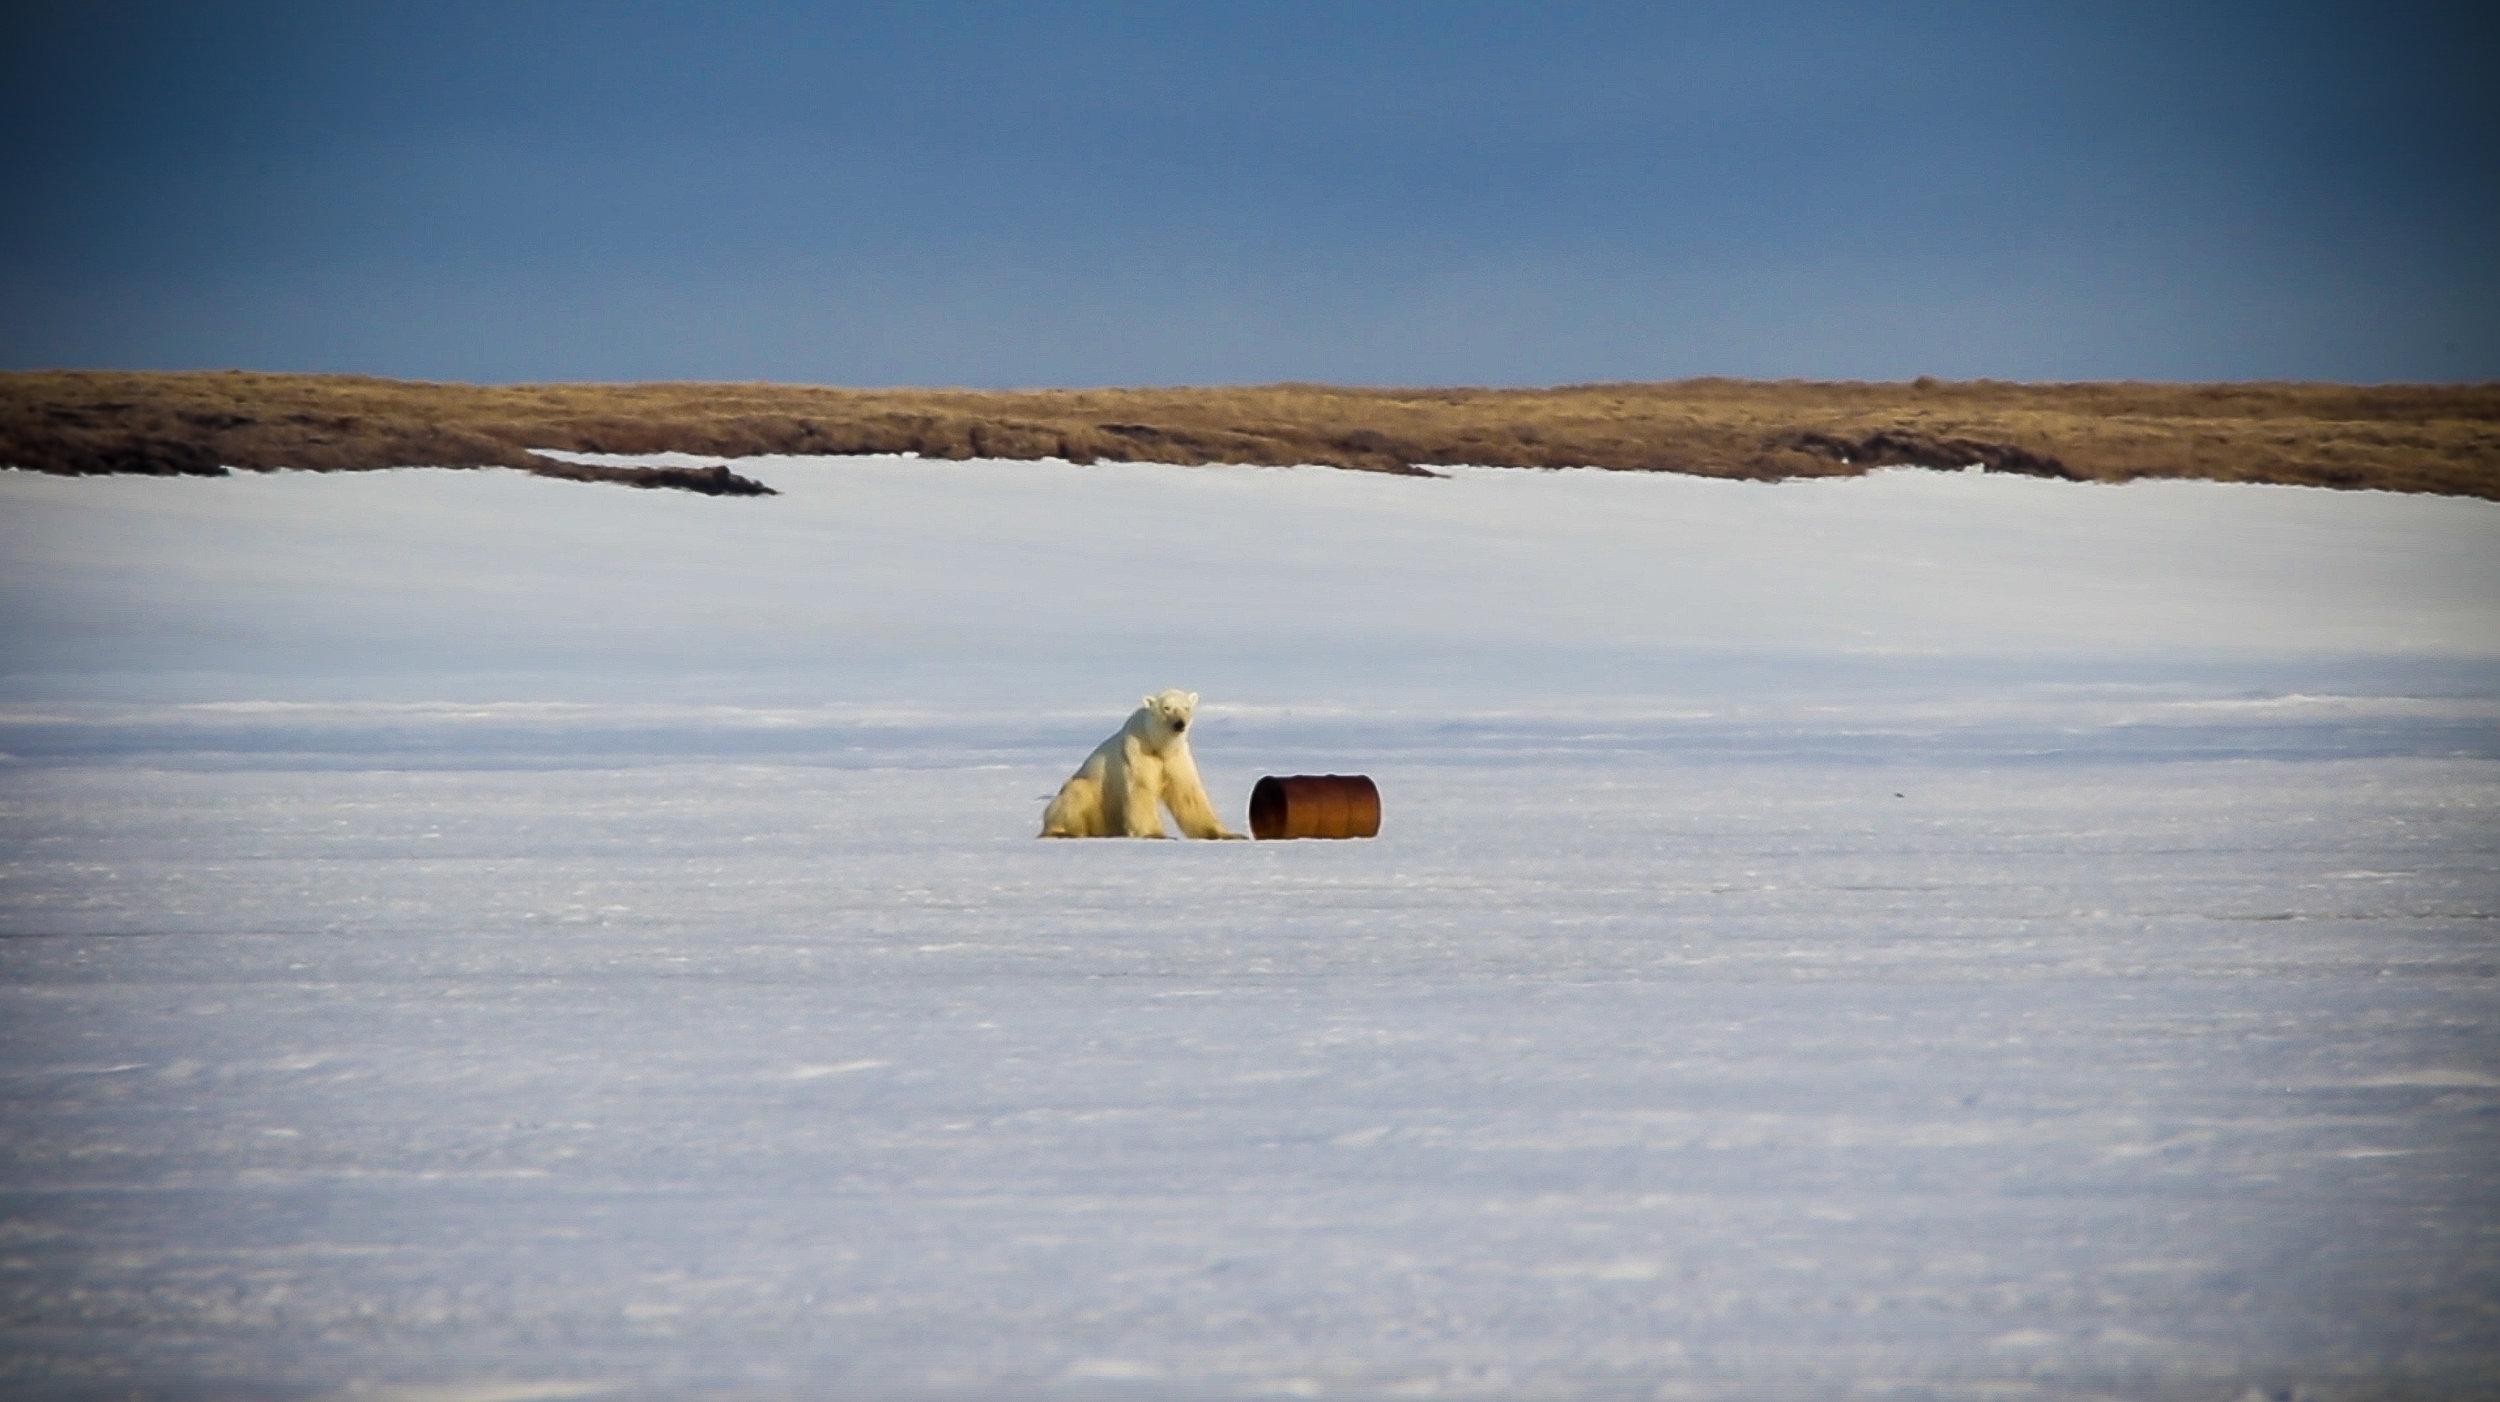 Polar Bear and Oil Barrel_Choose Oil or Environment.jpg